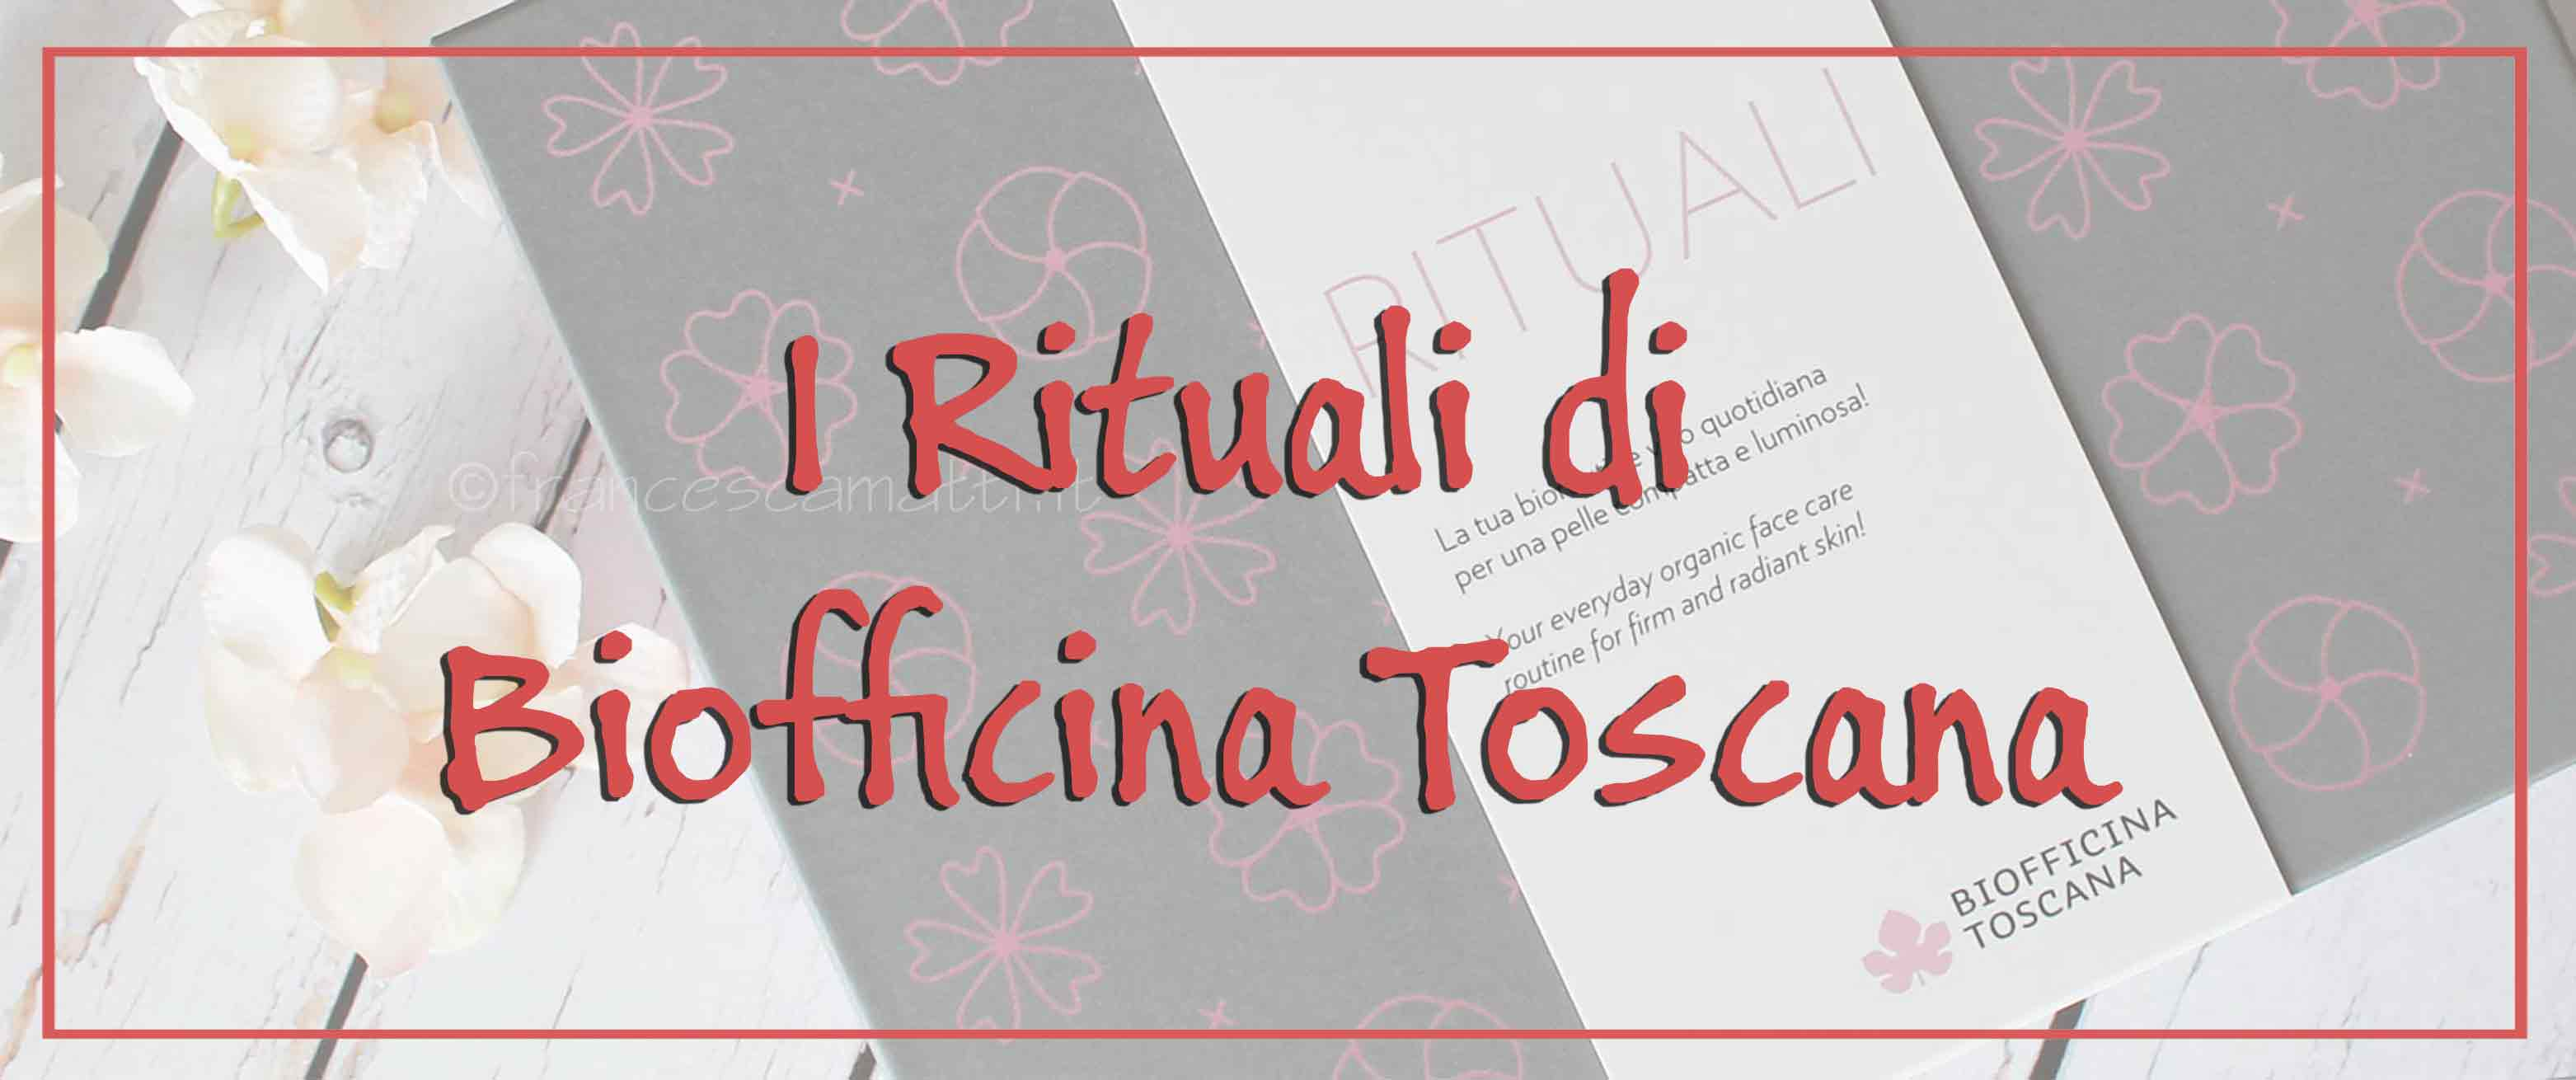 Rituali Biofficina Toscana